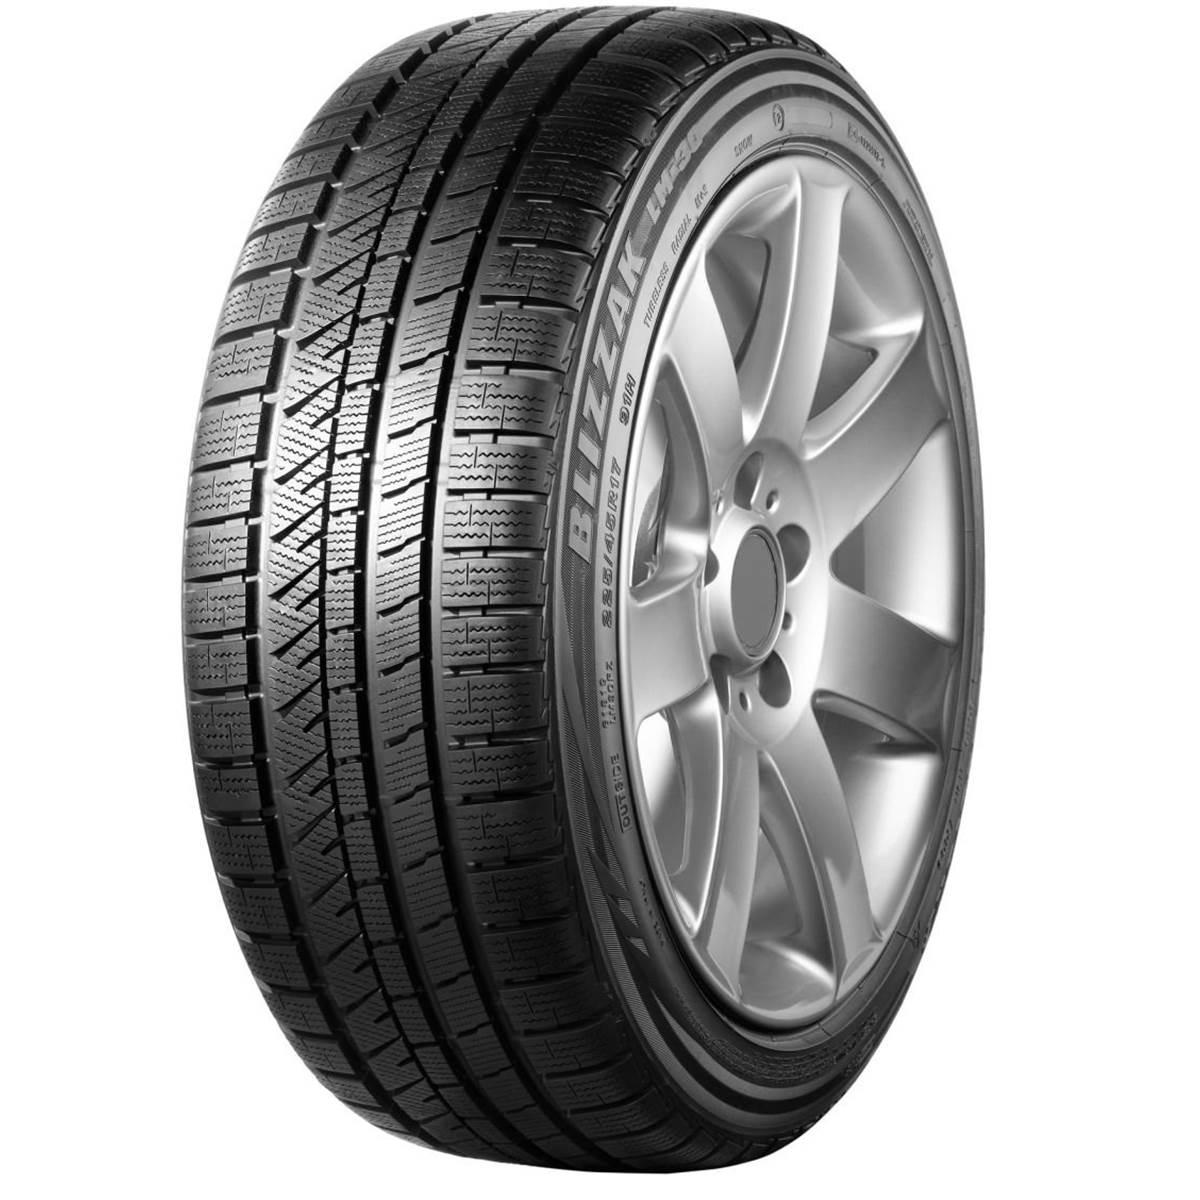 Pneu Hiver Bridgestone 185/55R15 86H Blizzak Lm30 XL